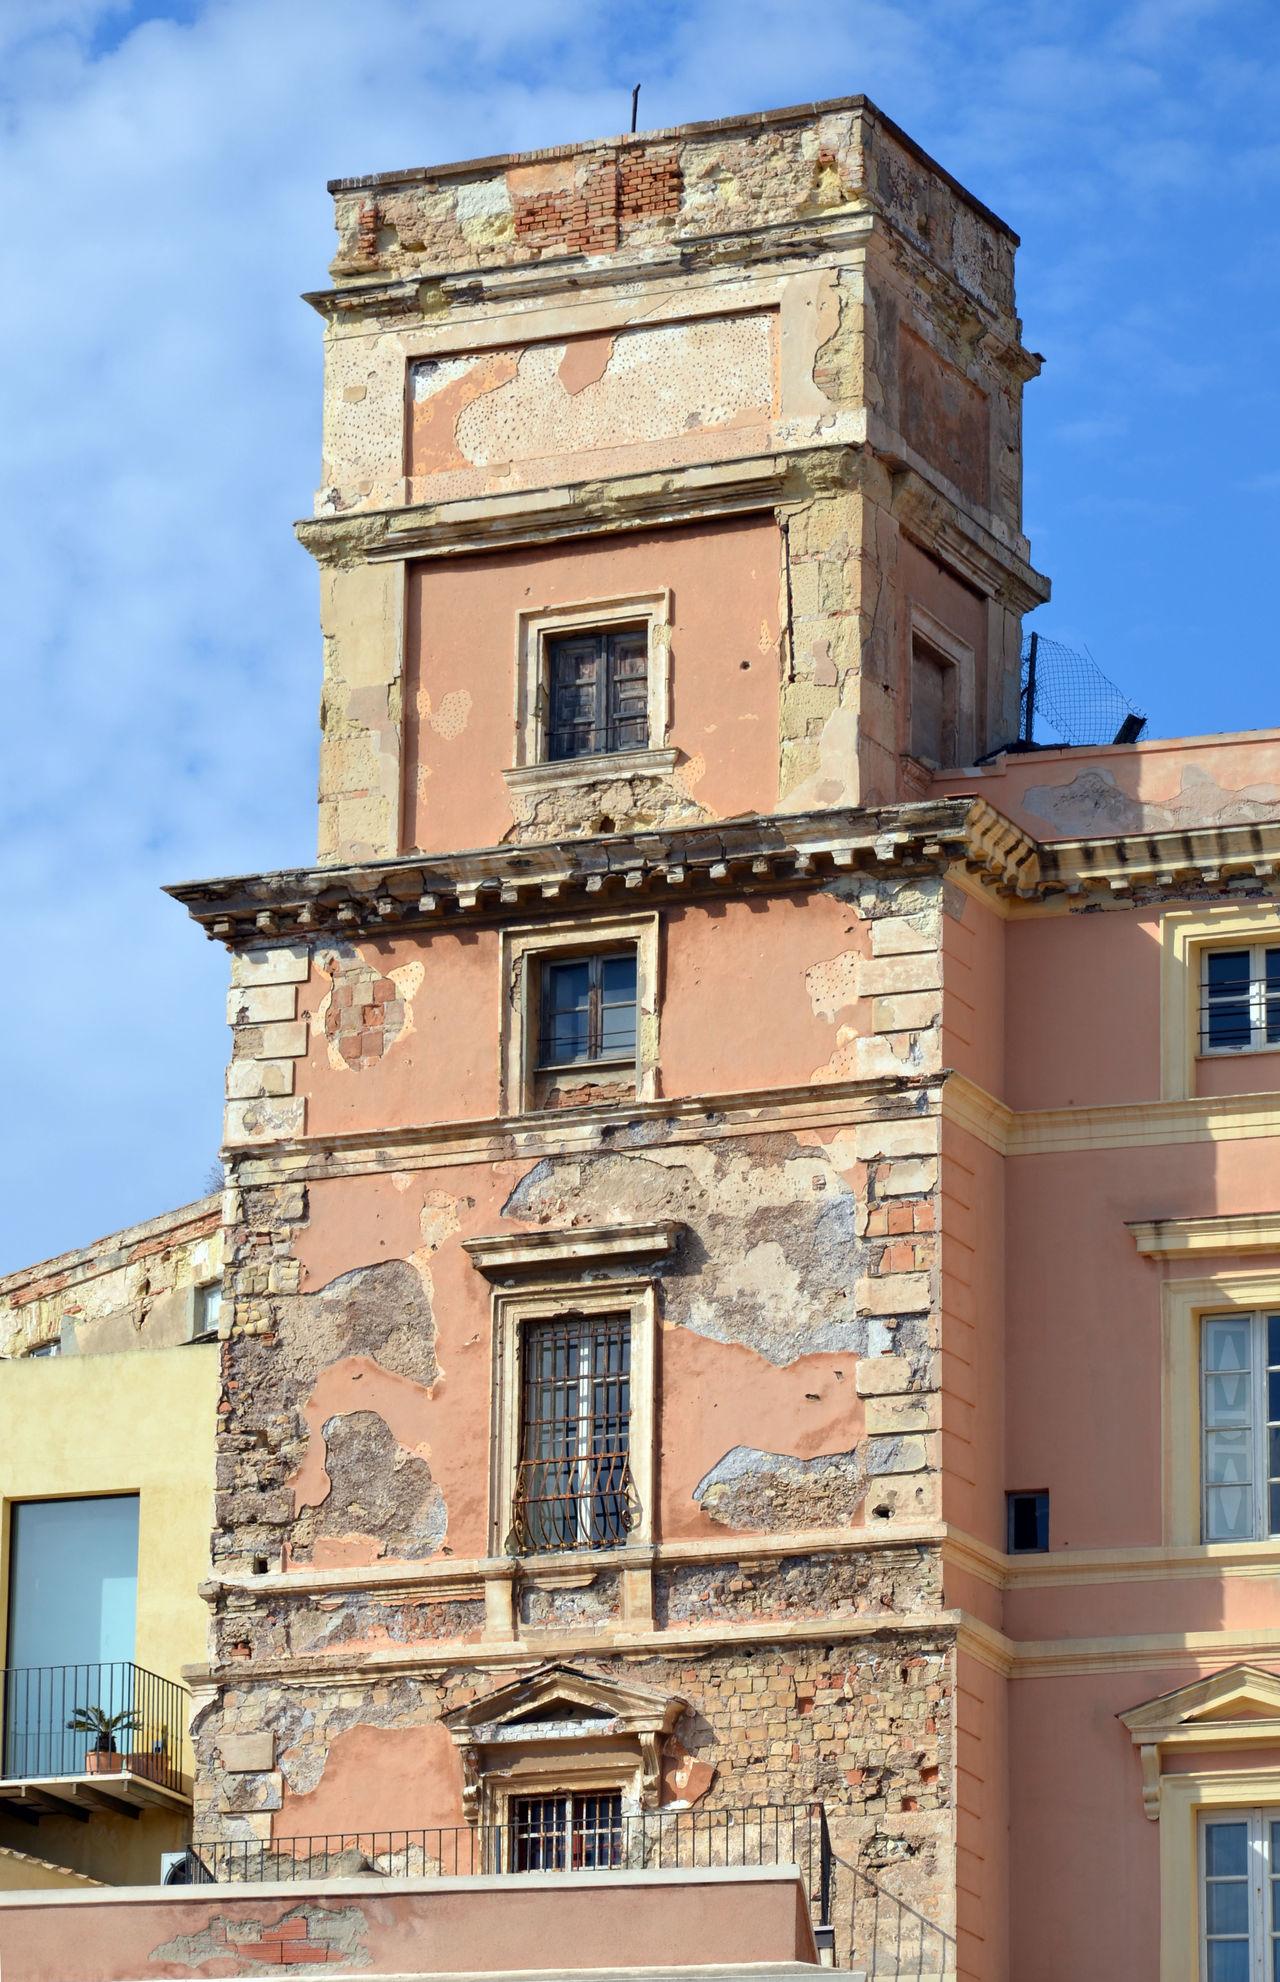 Old facade Architecture Building Exterior Cagliari Cagliari Urban City Cagliari, Sardinia Cagliary Façade Historic Italy Ruined